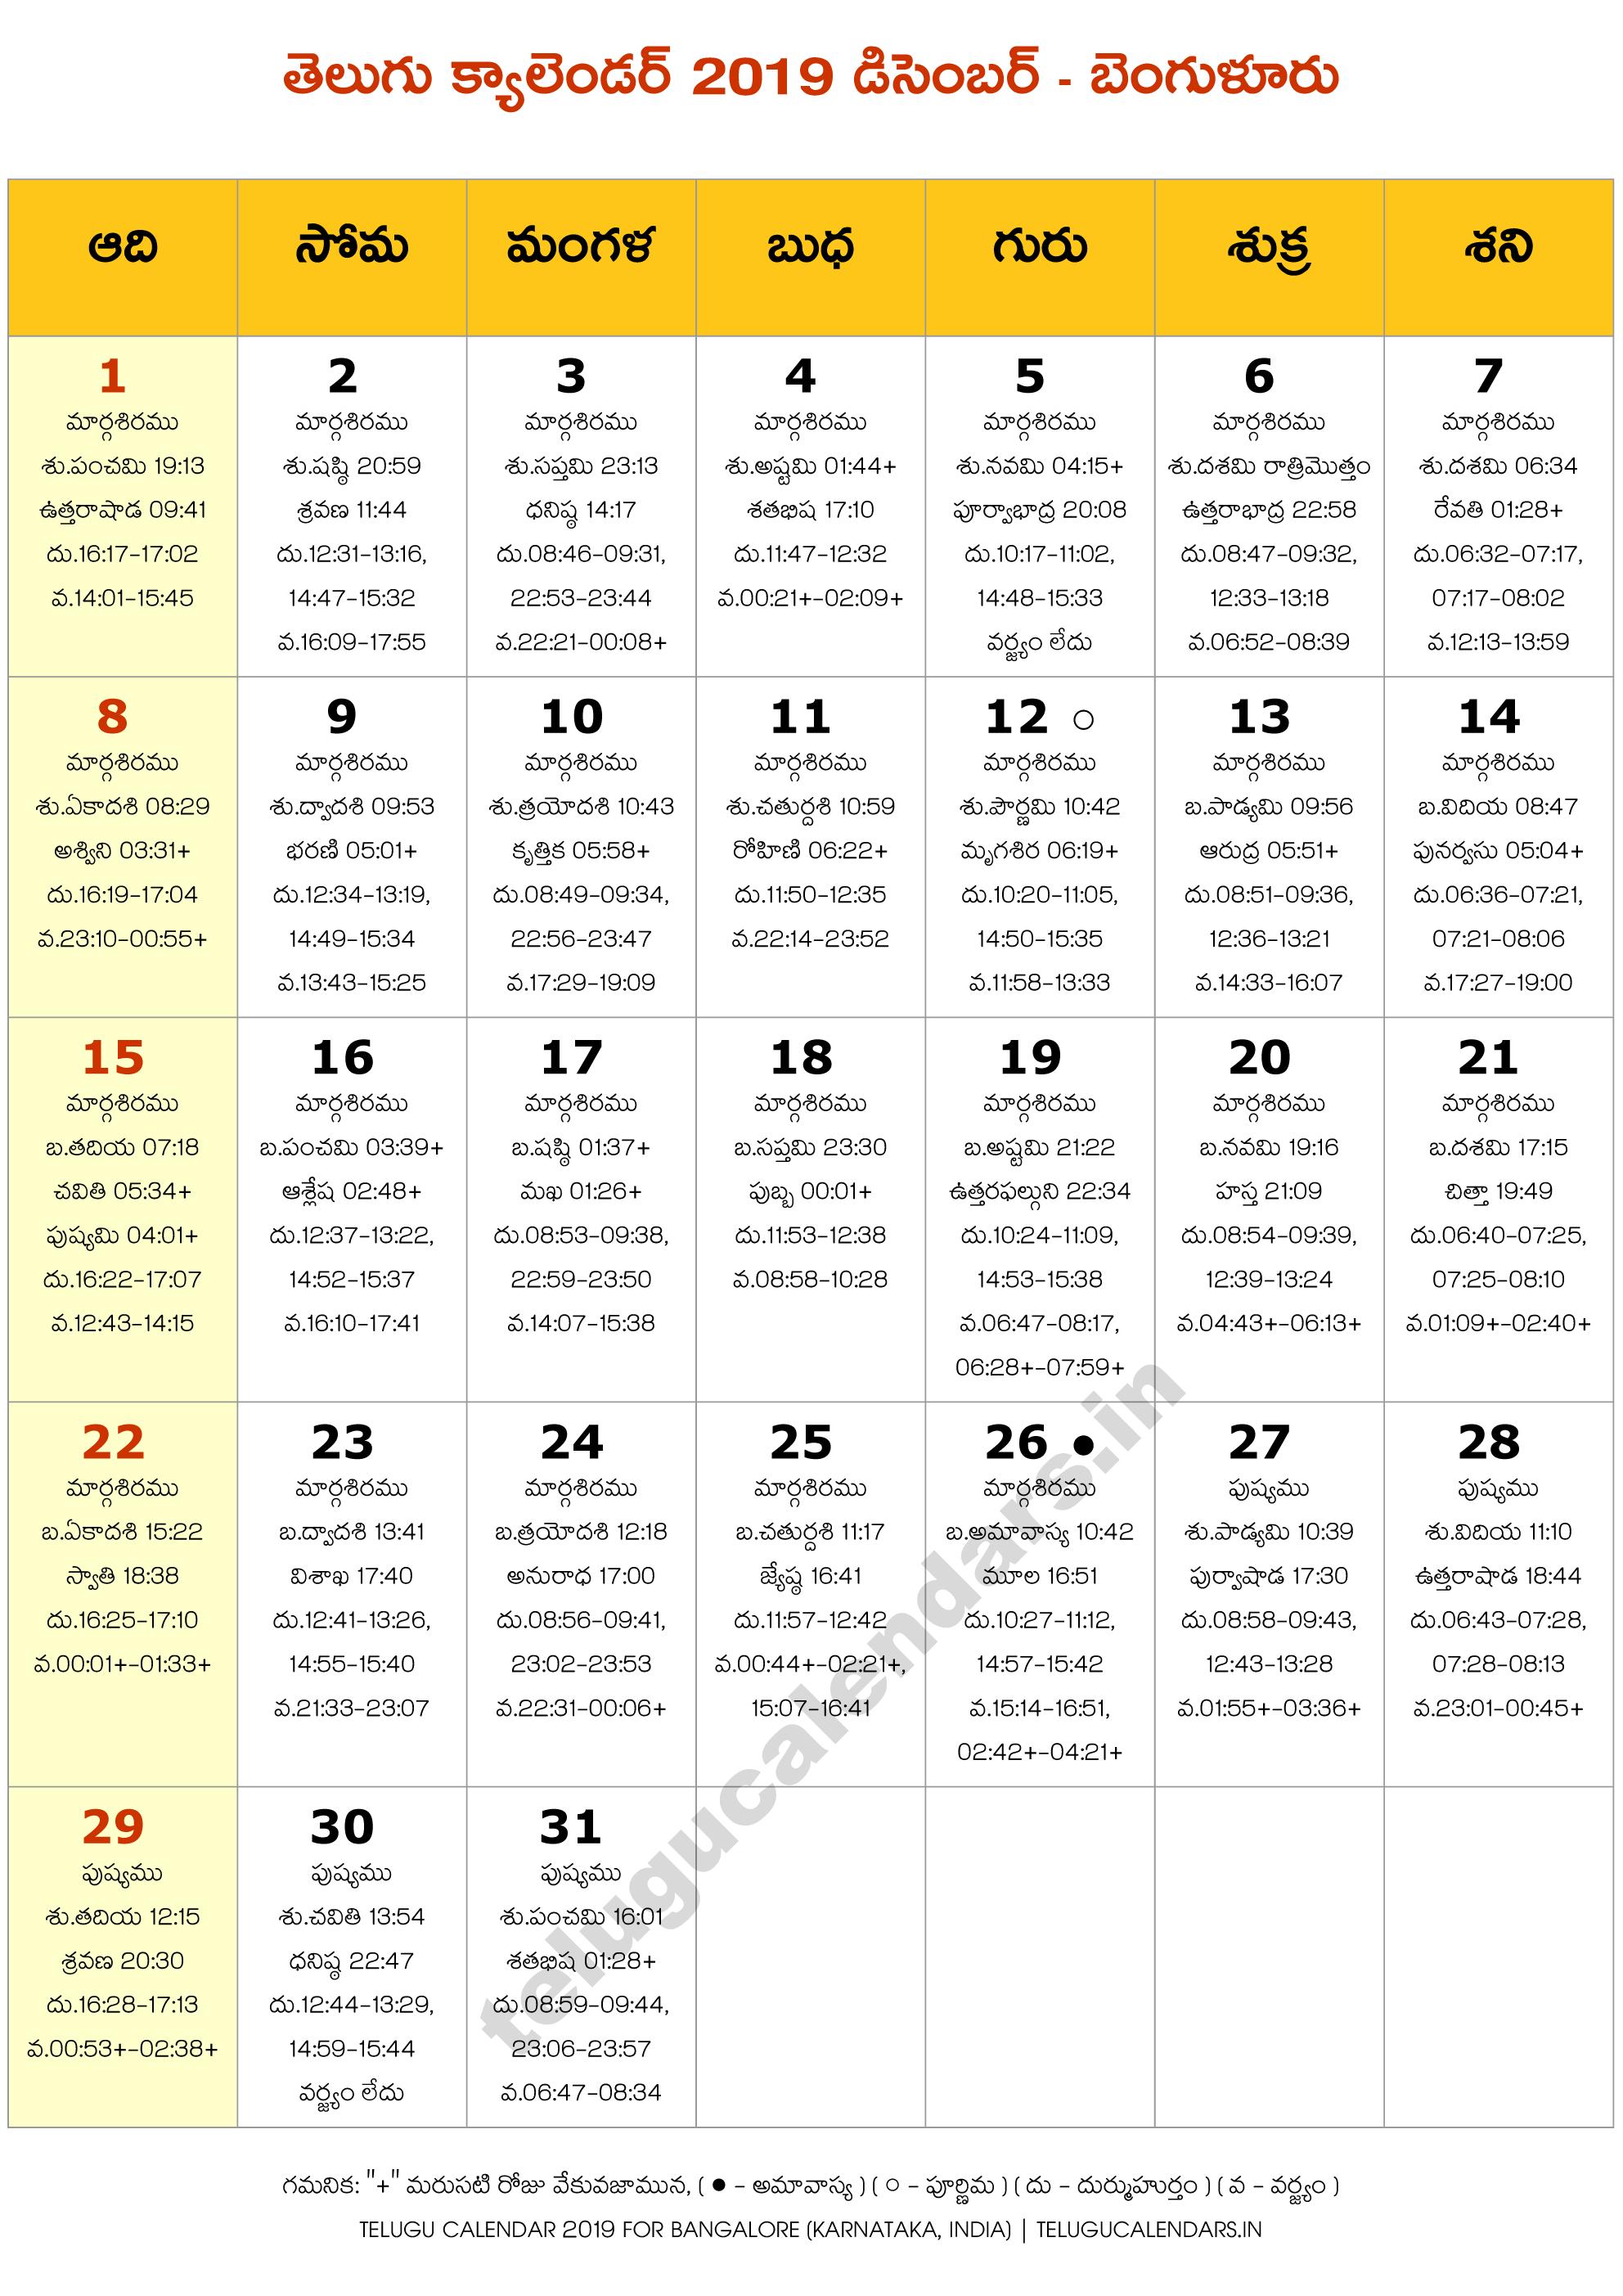 Bengaluru 2019 December Telugu Calendar | Telugu Calendars